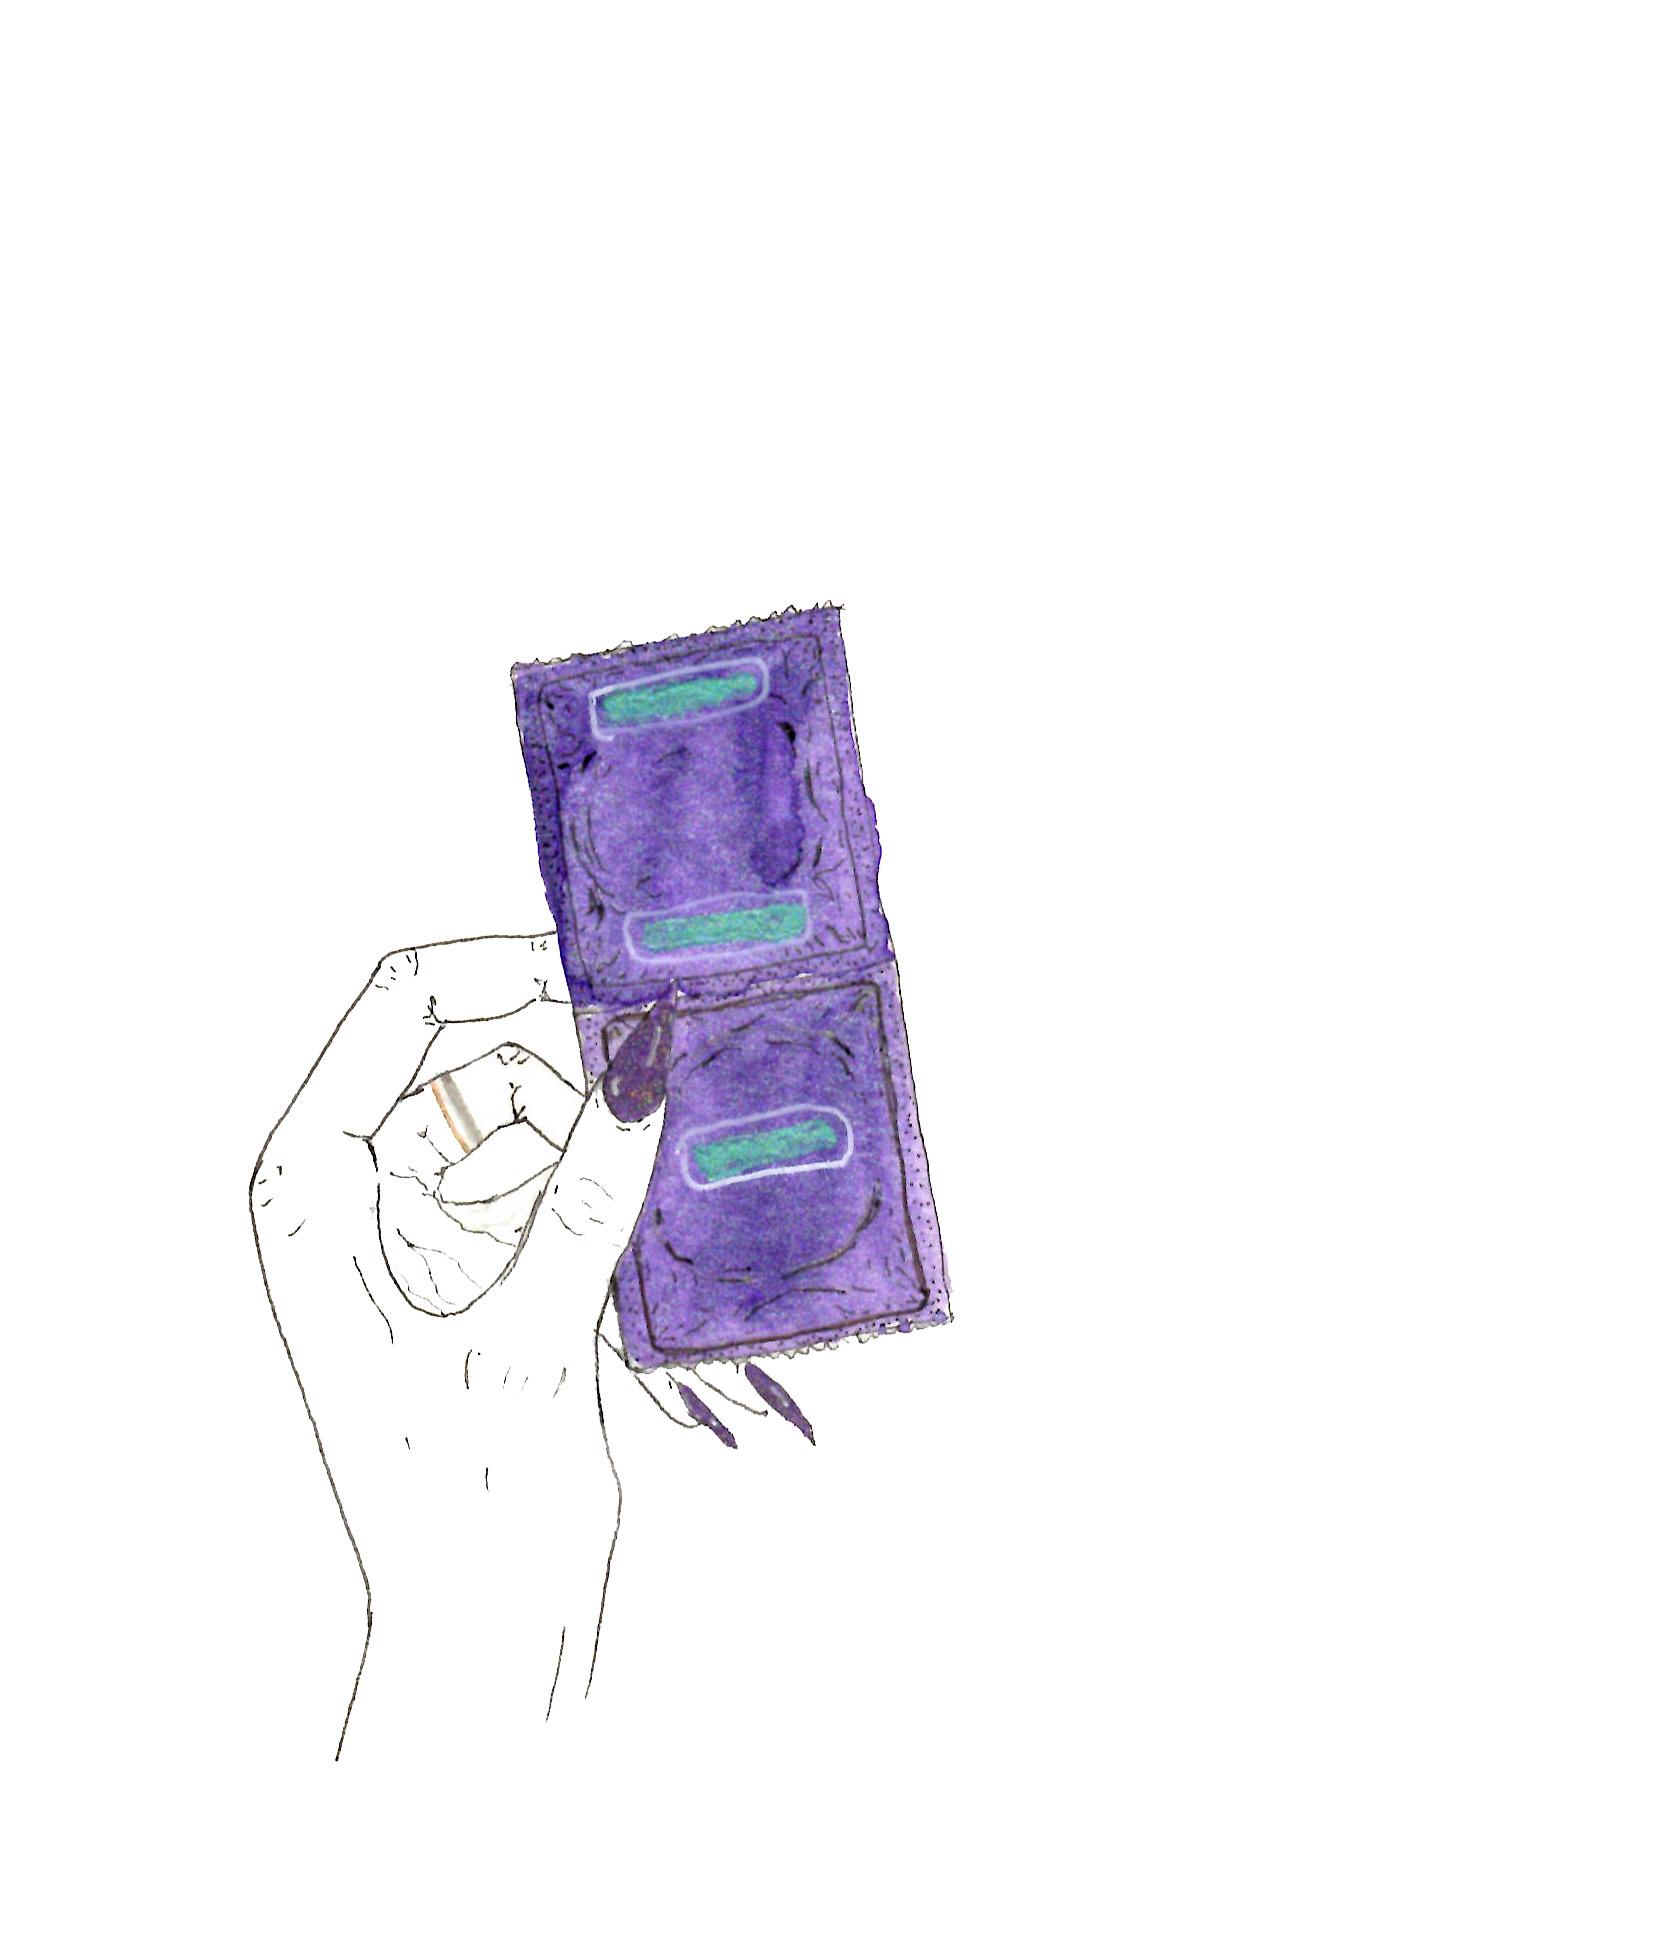 purple-condom-for-web.jpg